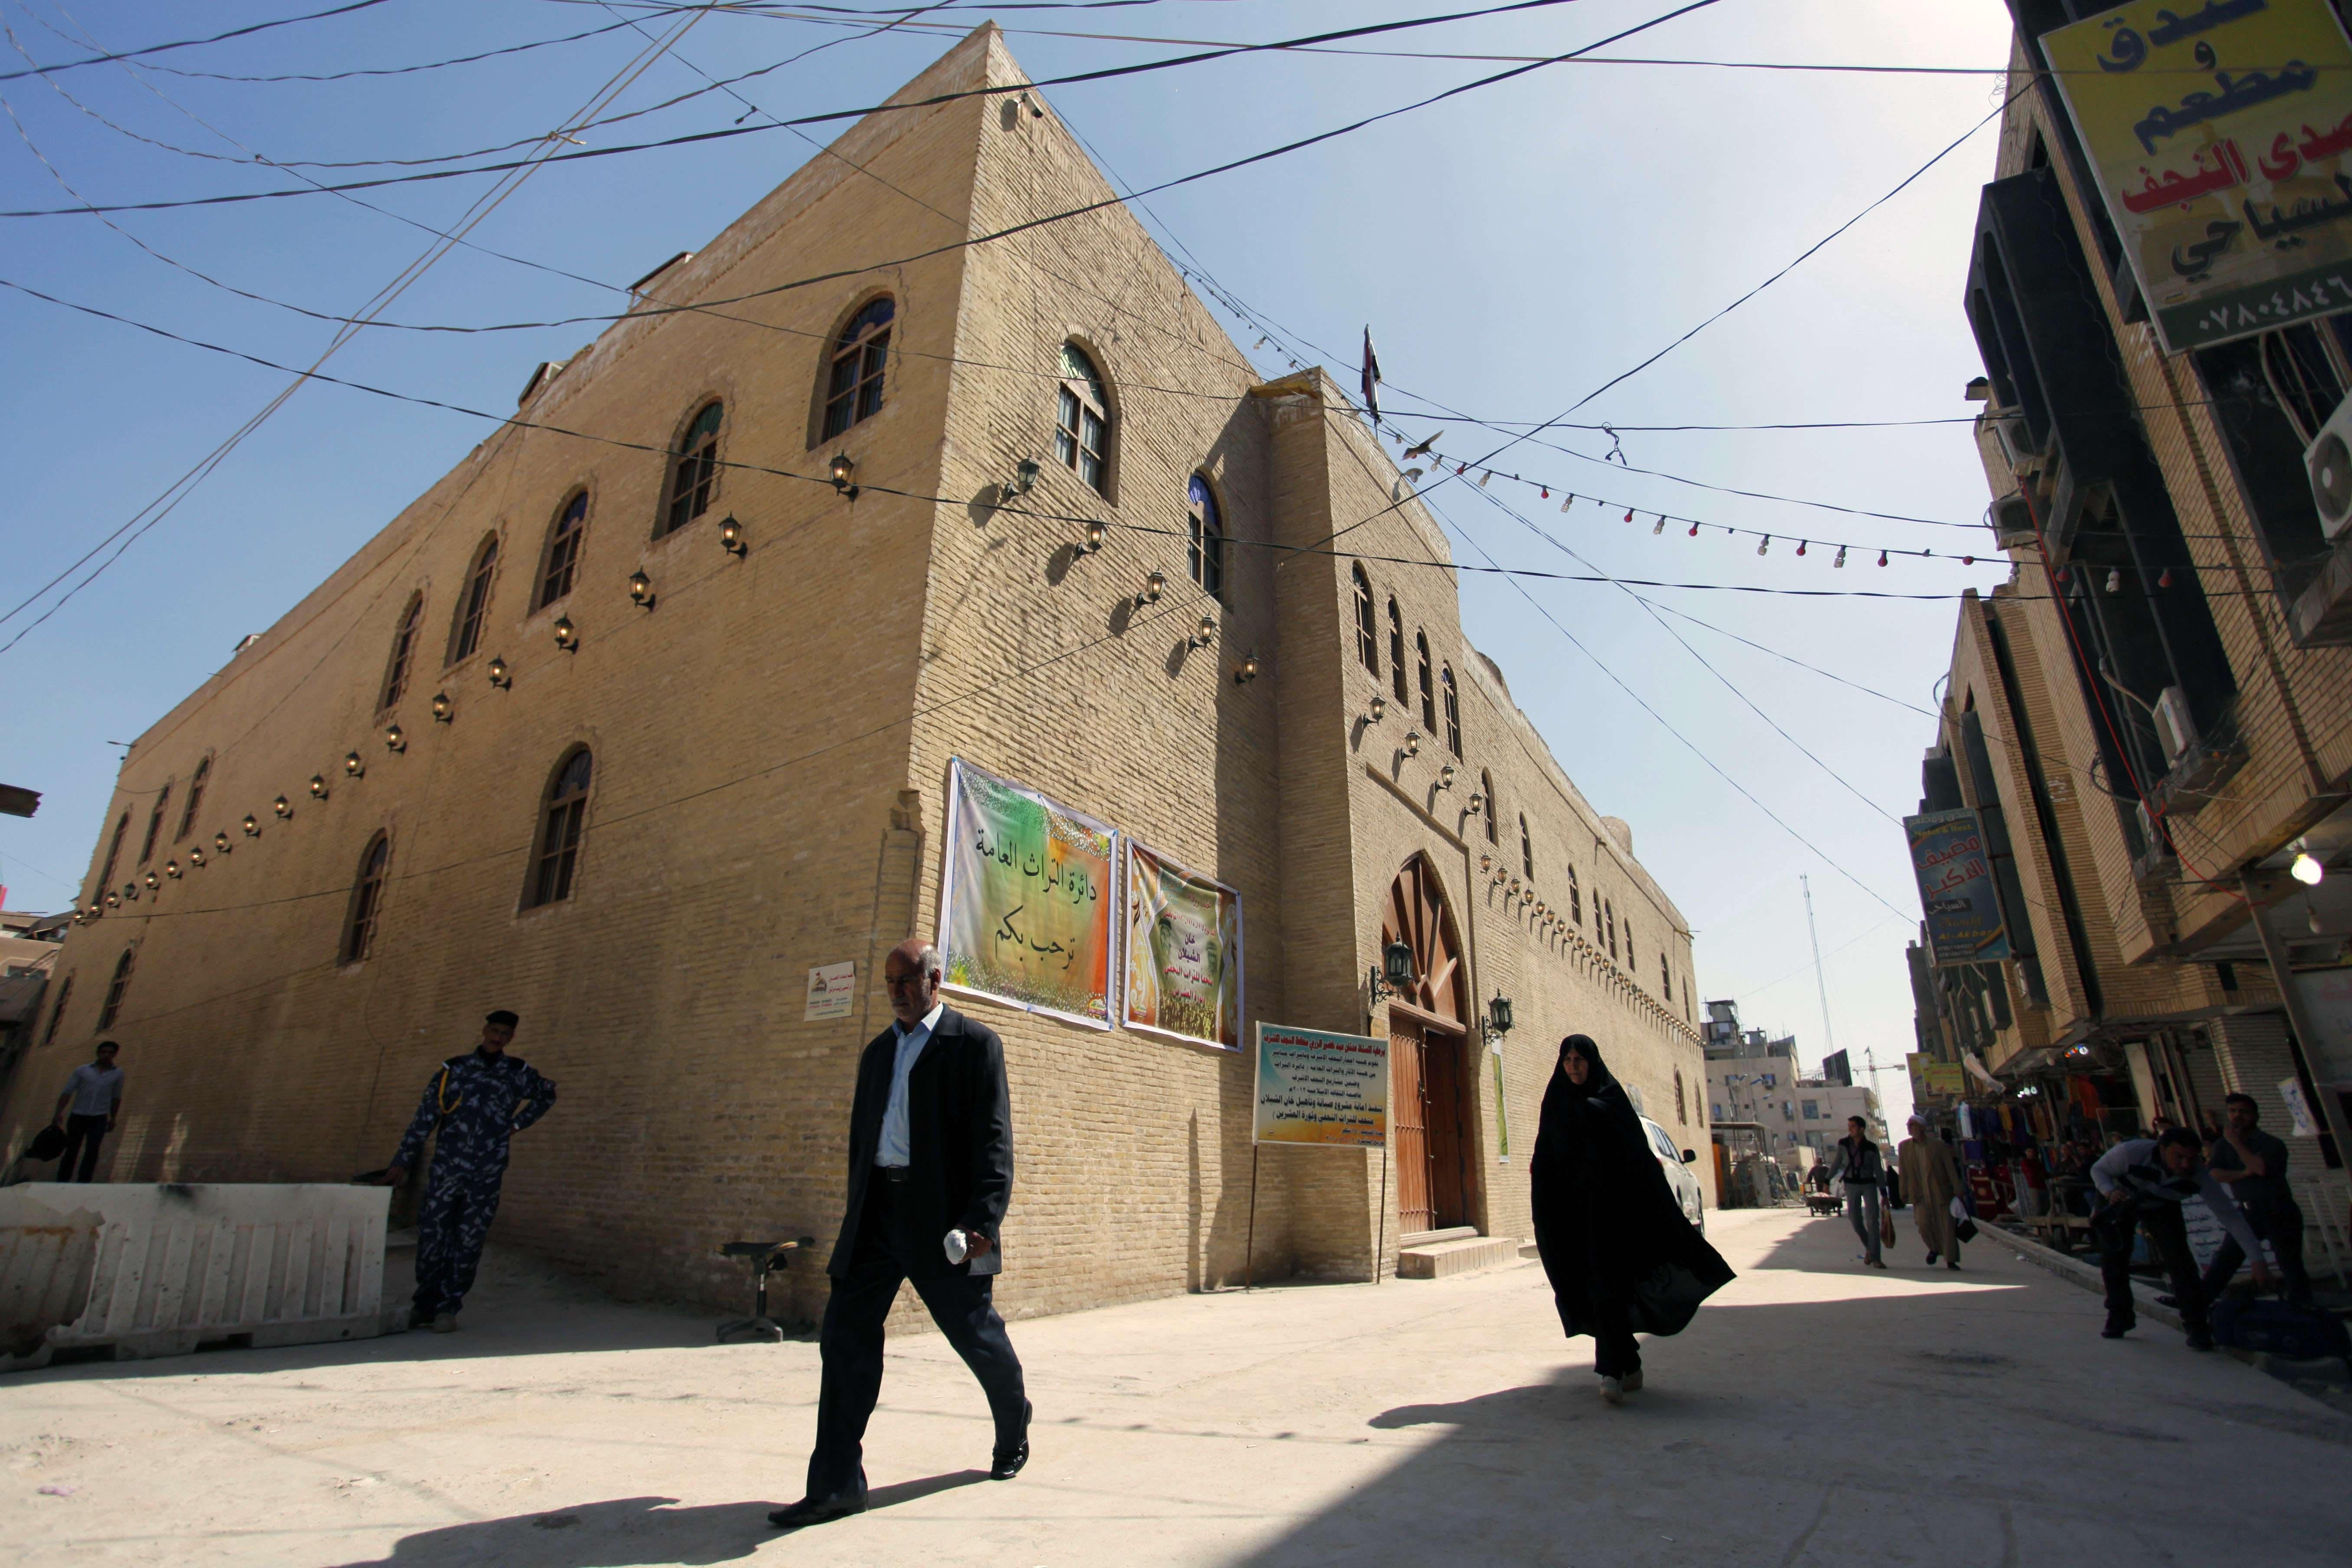 Iraqi museum opens to commemorate uprising against British occupation